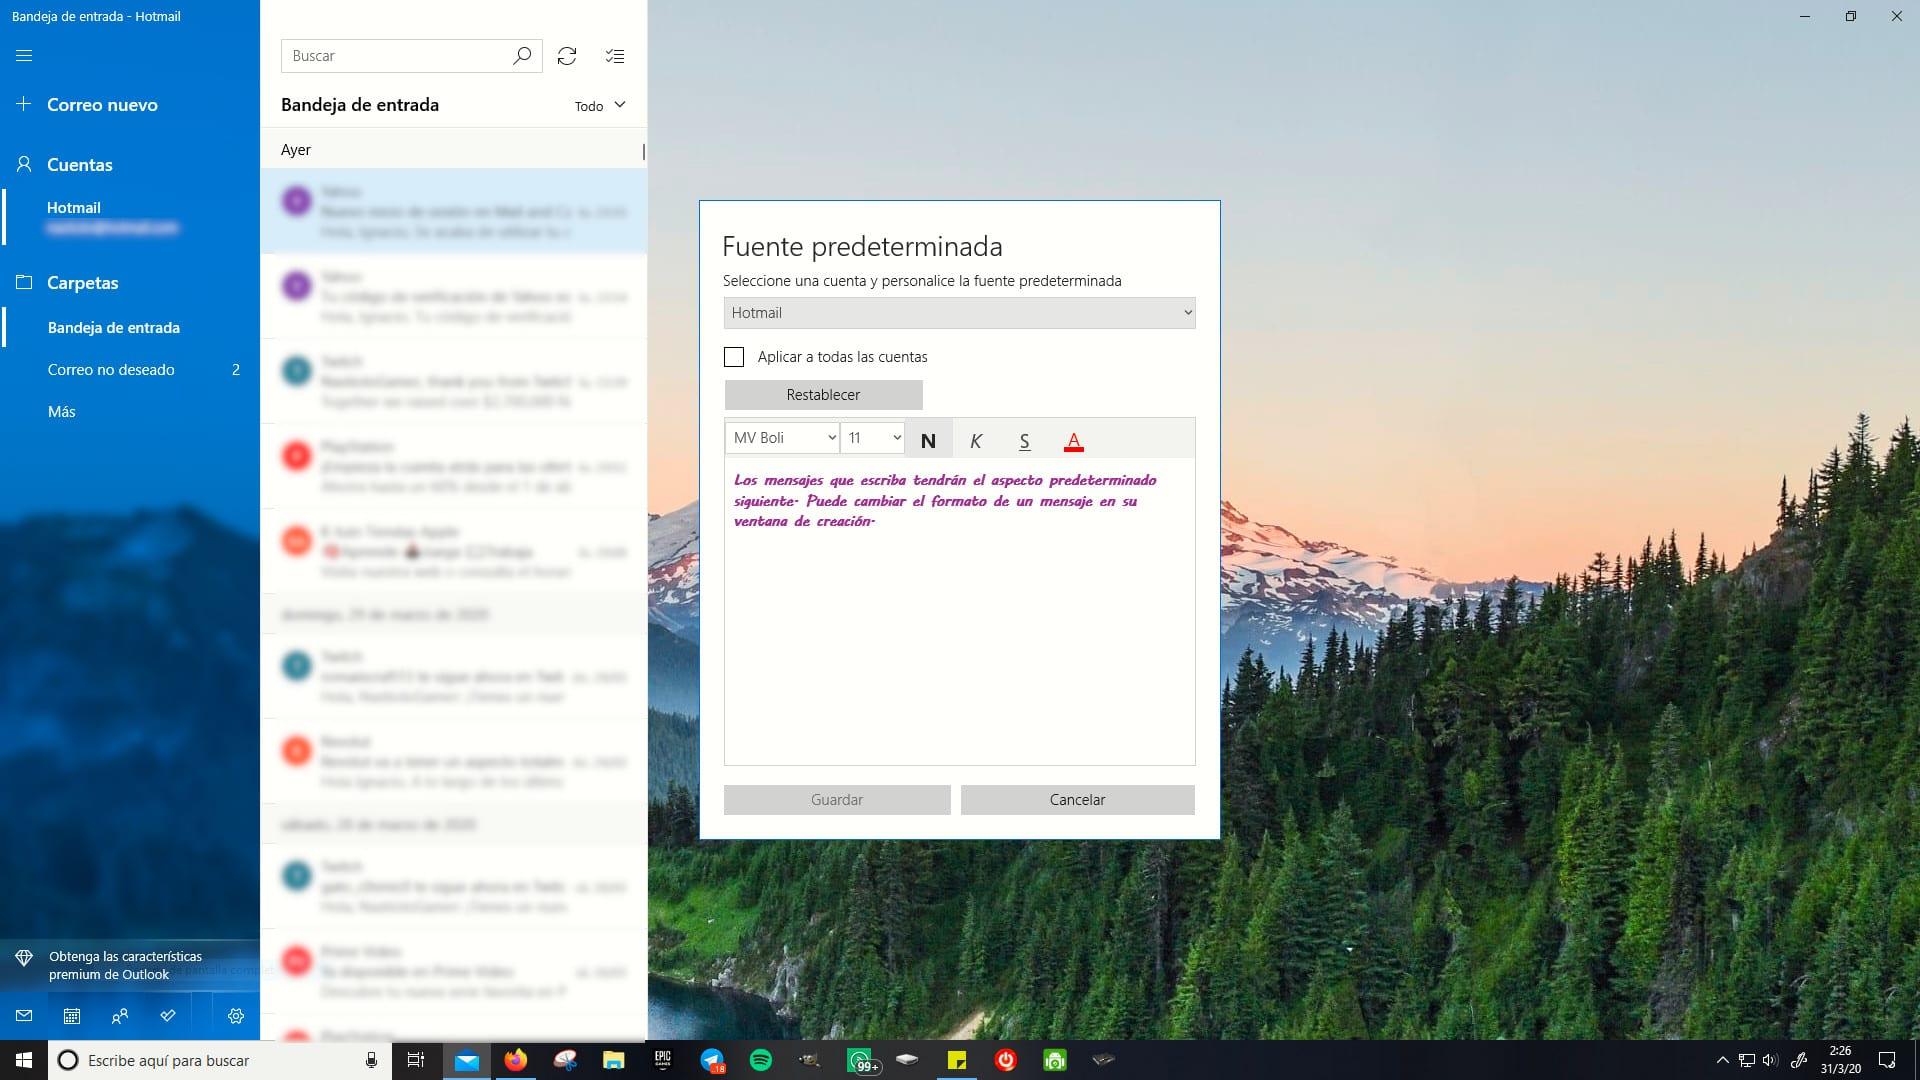 Cambiar fuente predeterminada aplicación Correo Windows 10